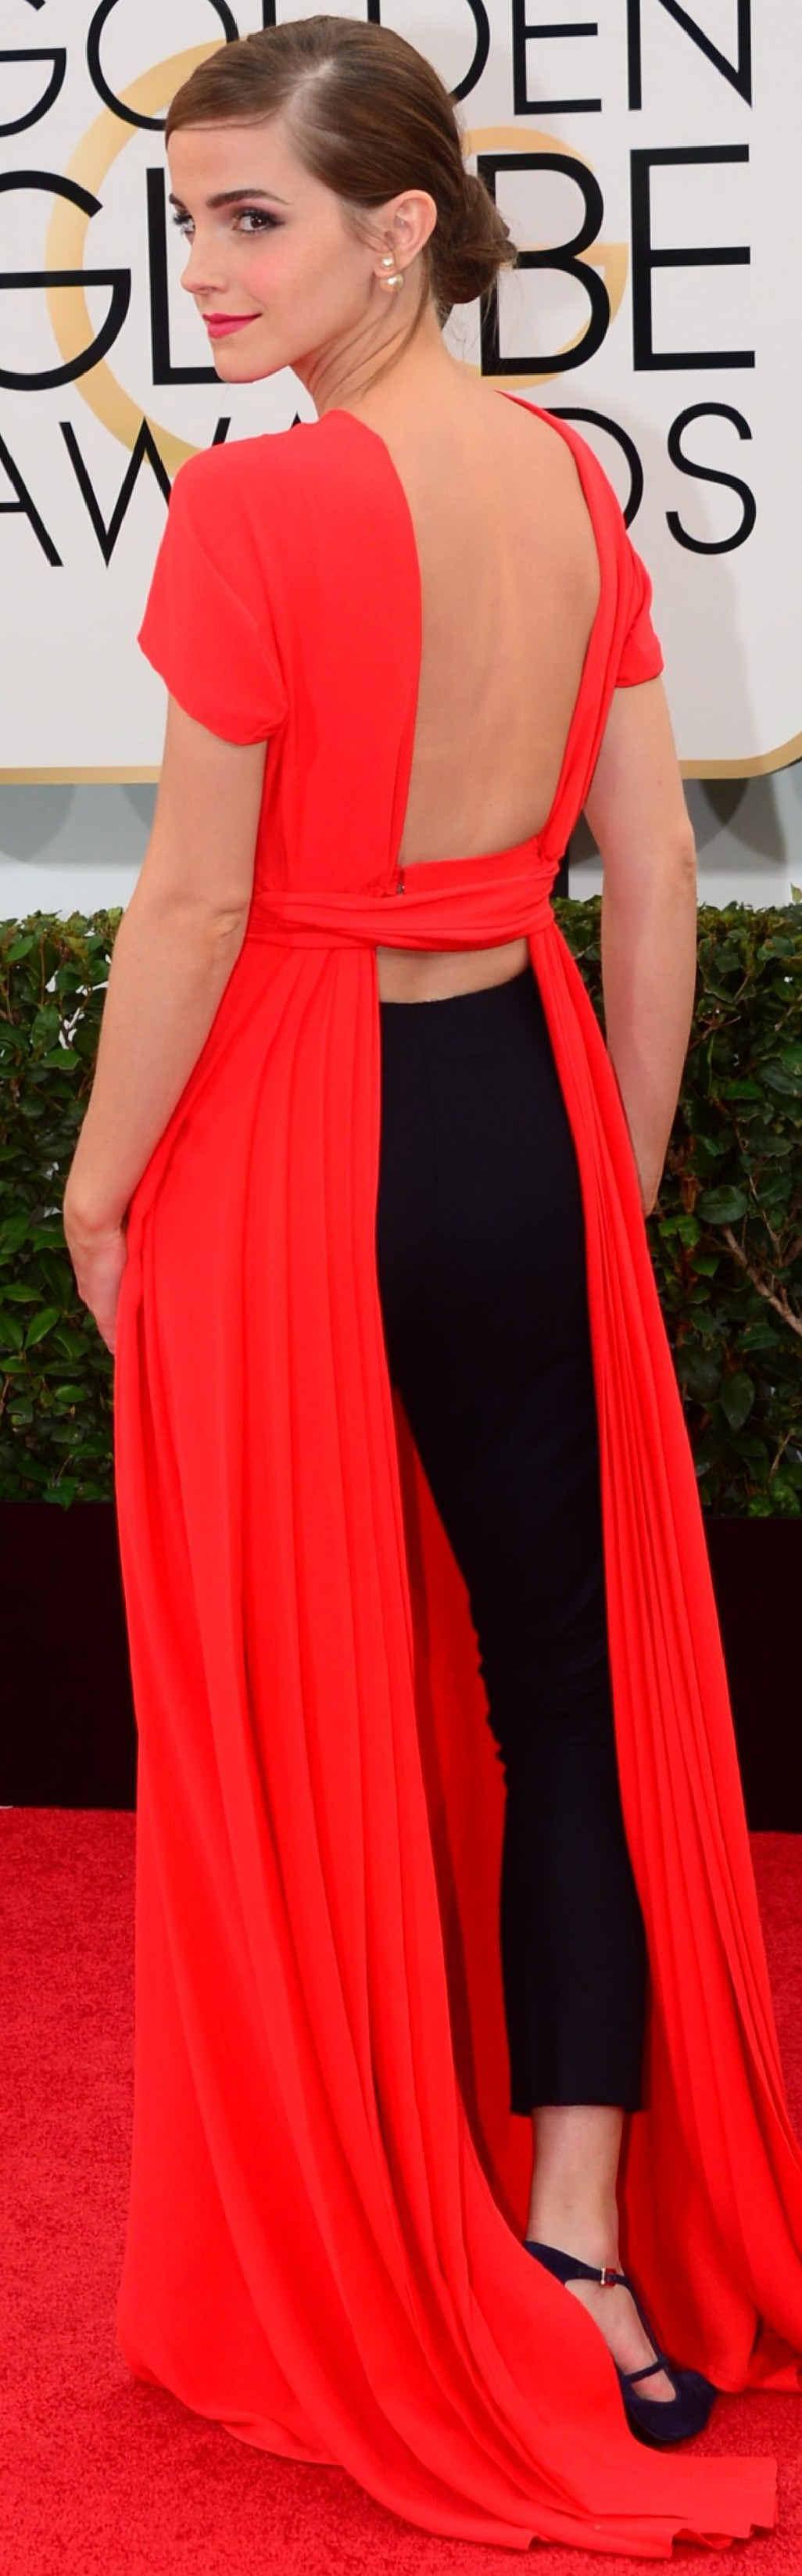 Emma Watson in eye-catching pants.